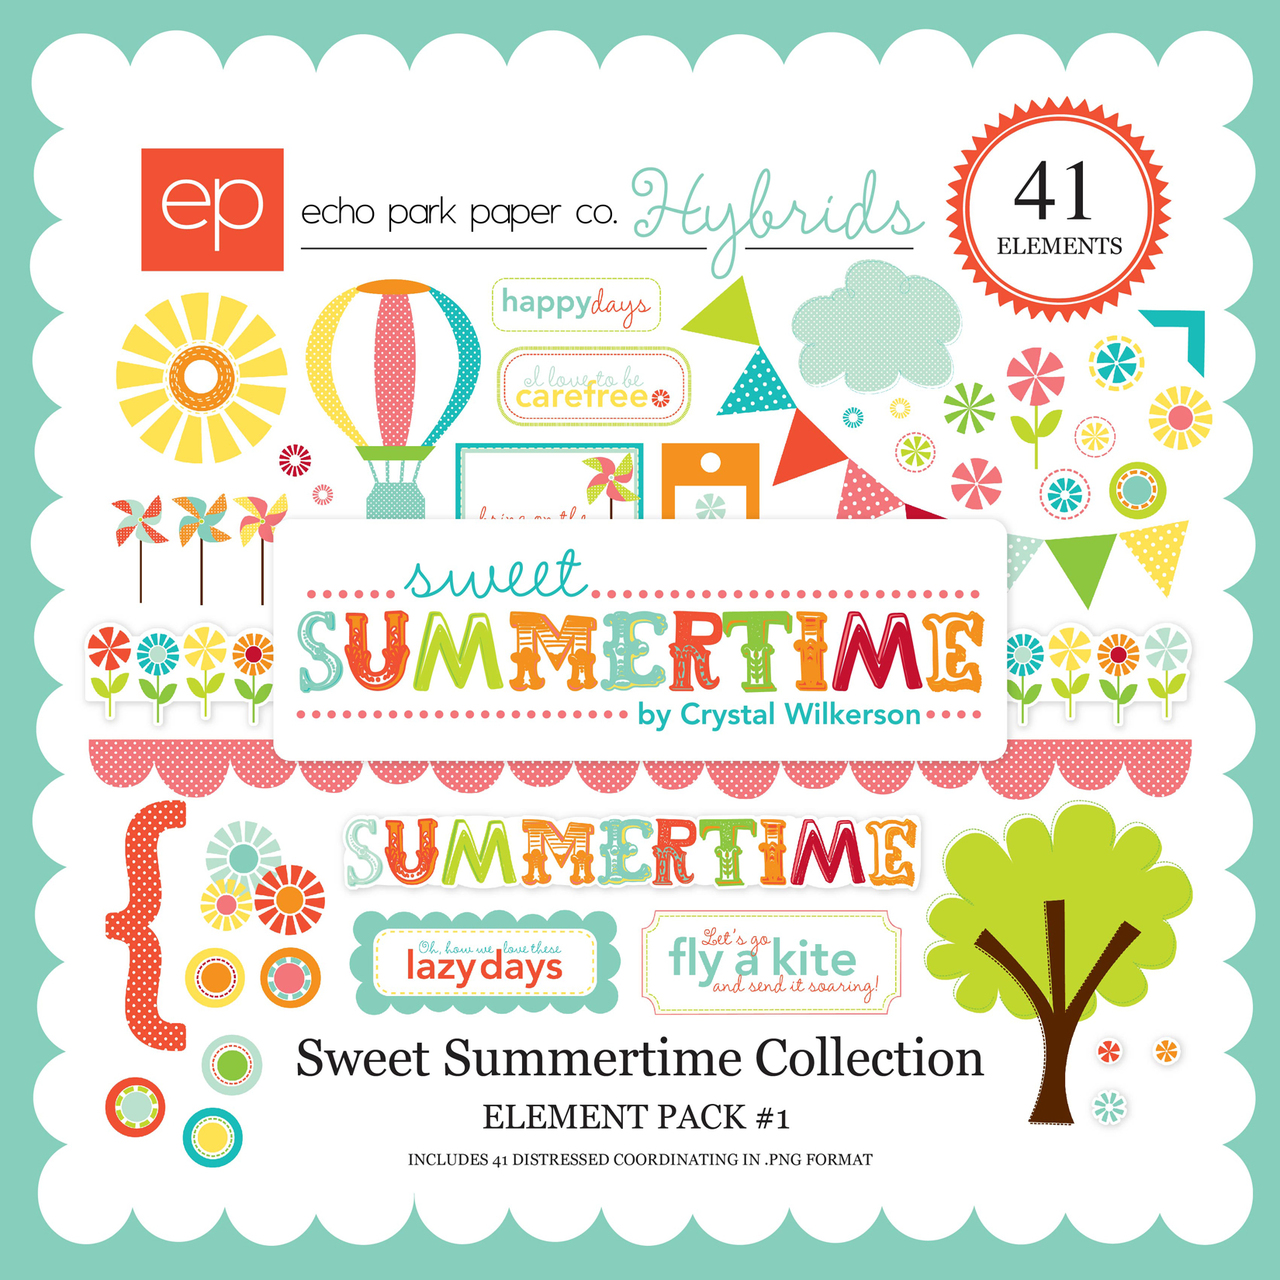 Sweet Summertime Element Pack #1